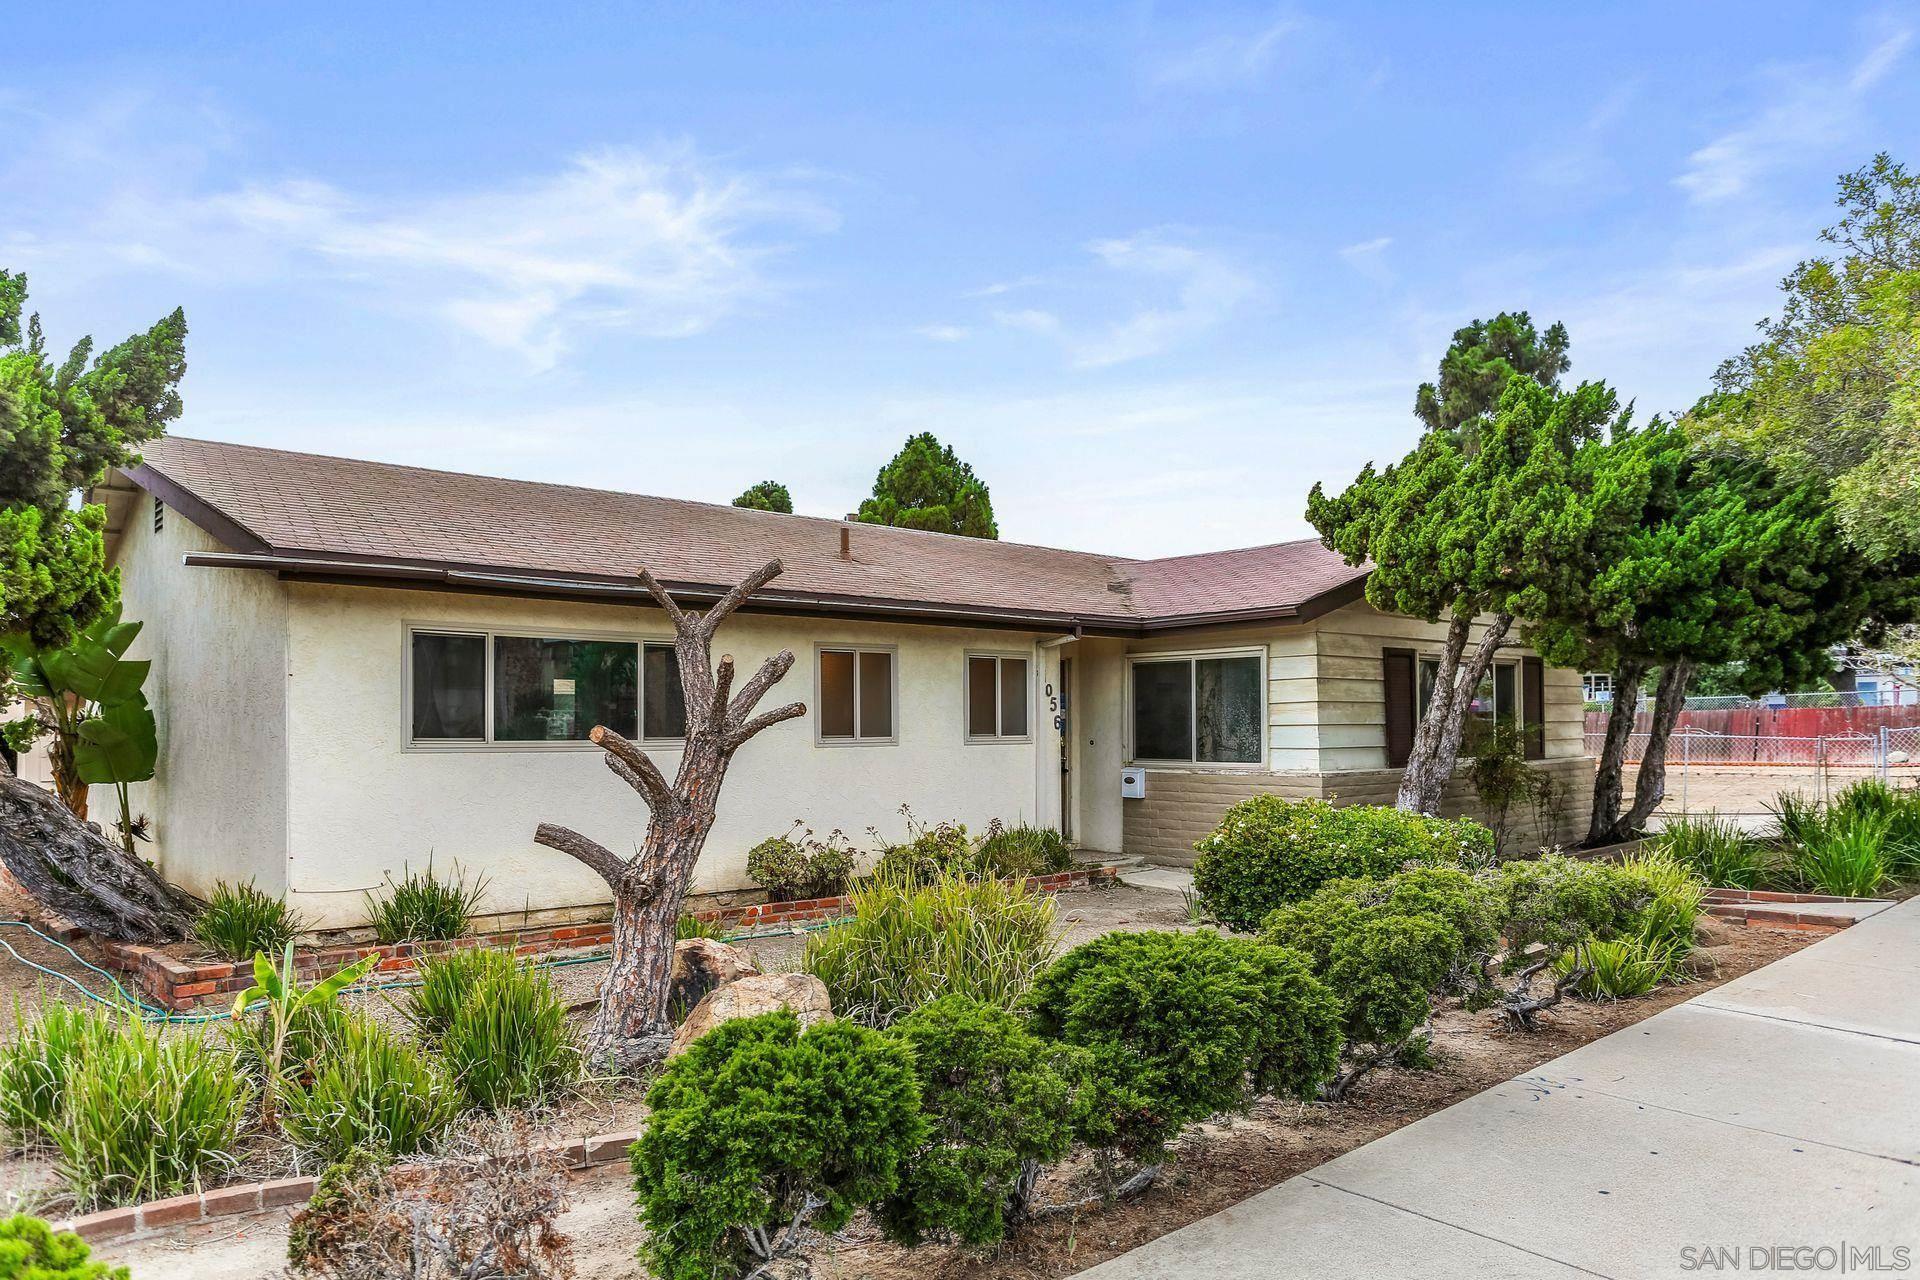 Photo of 1056 Fourth Ave, Chula Vista, CA 91911 (MLS # 210020999)